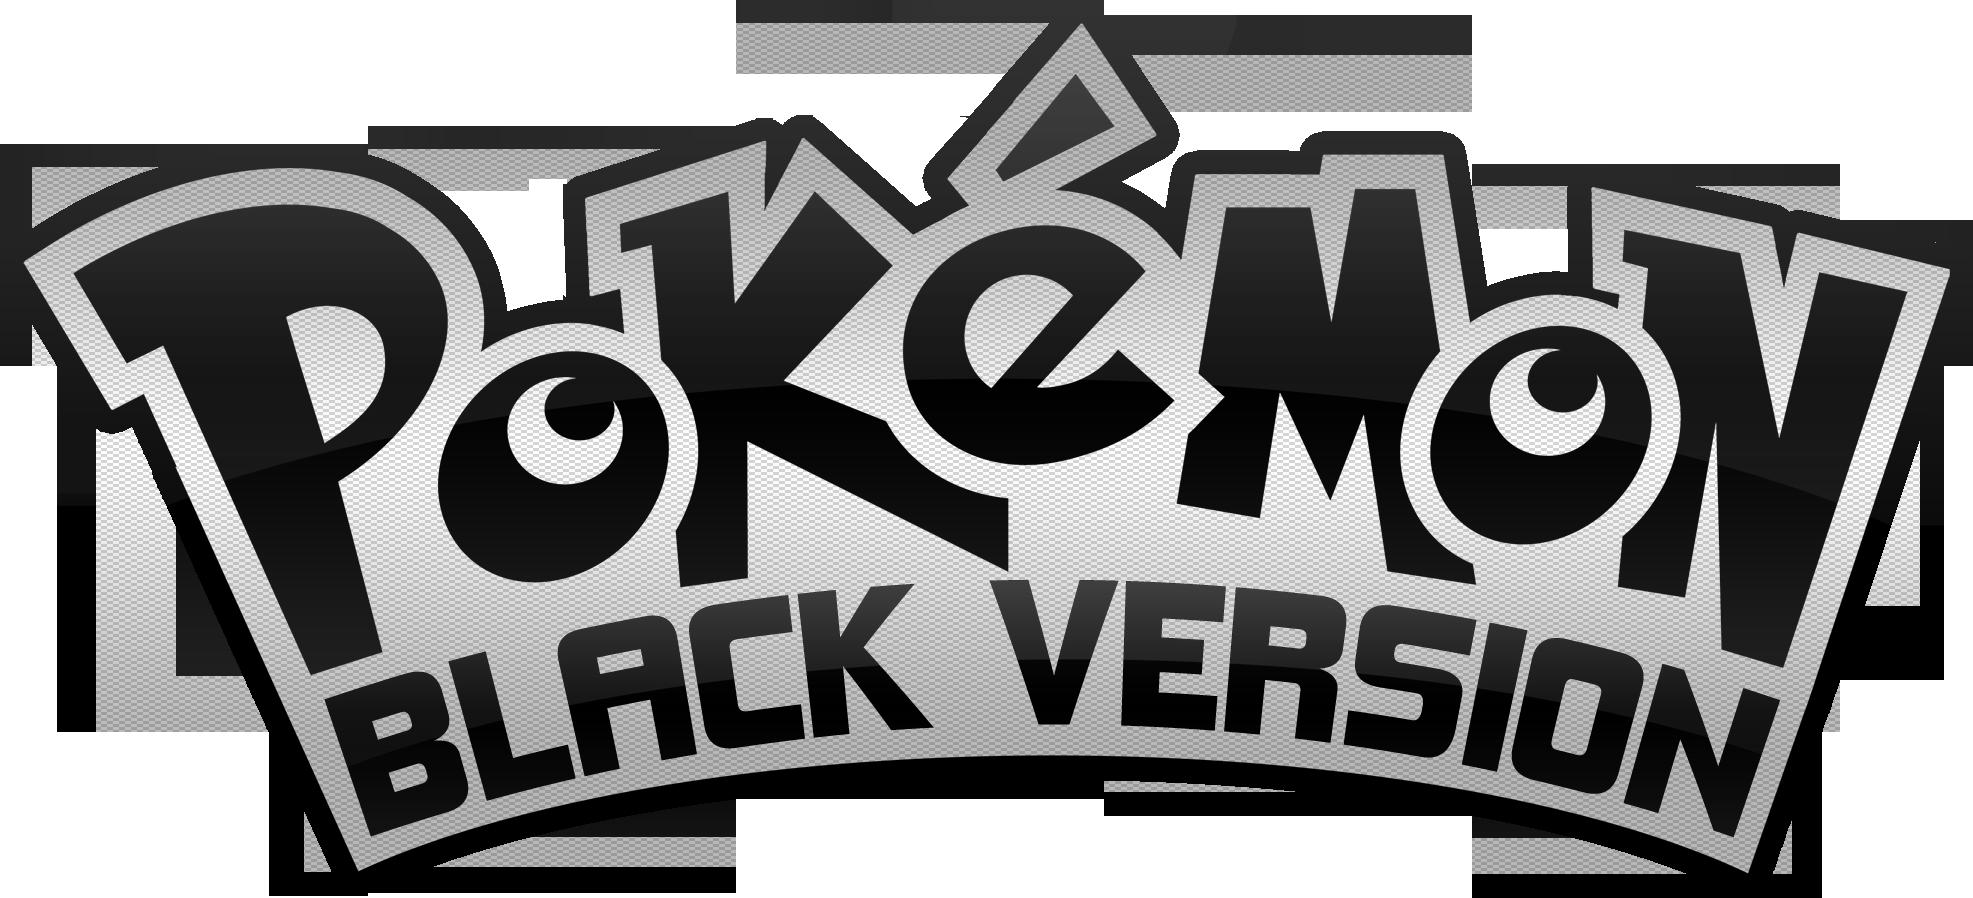 Pokemon Black Version Logo by Nalty on DeviantArt